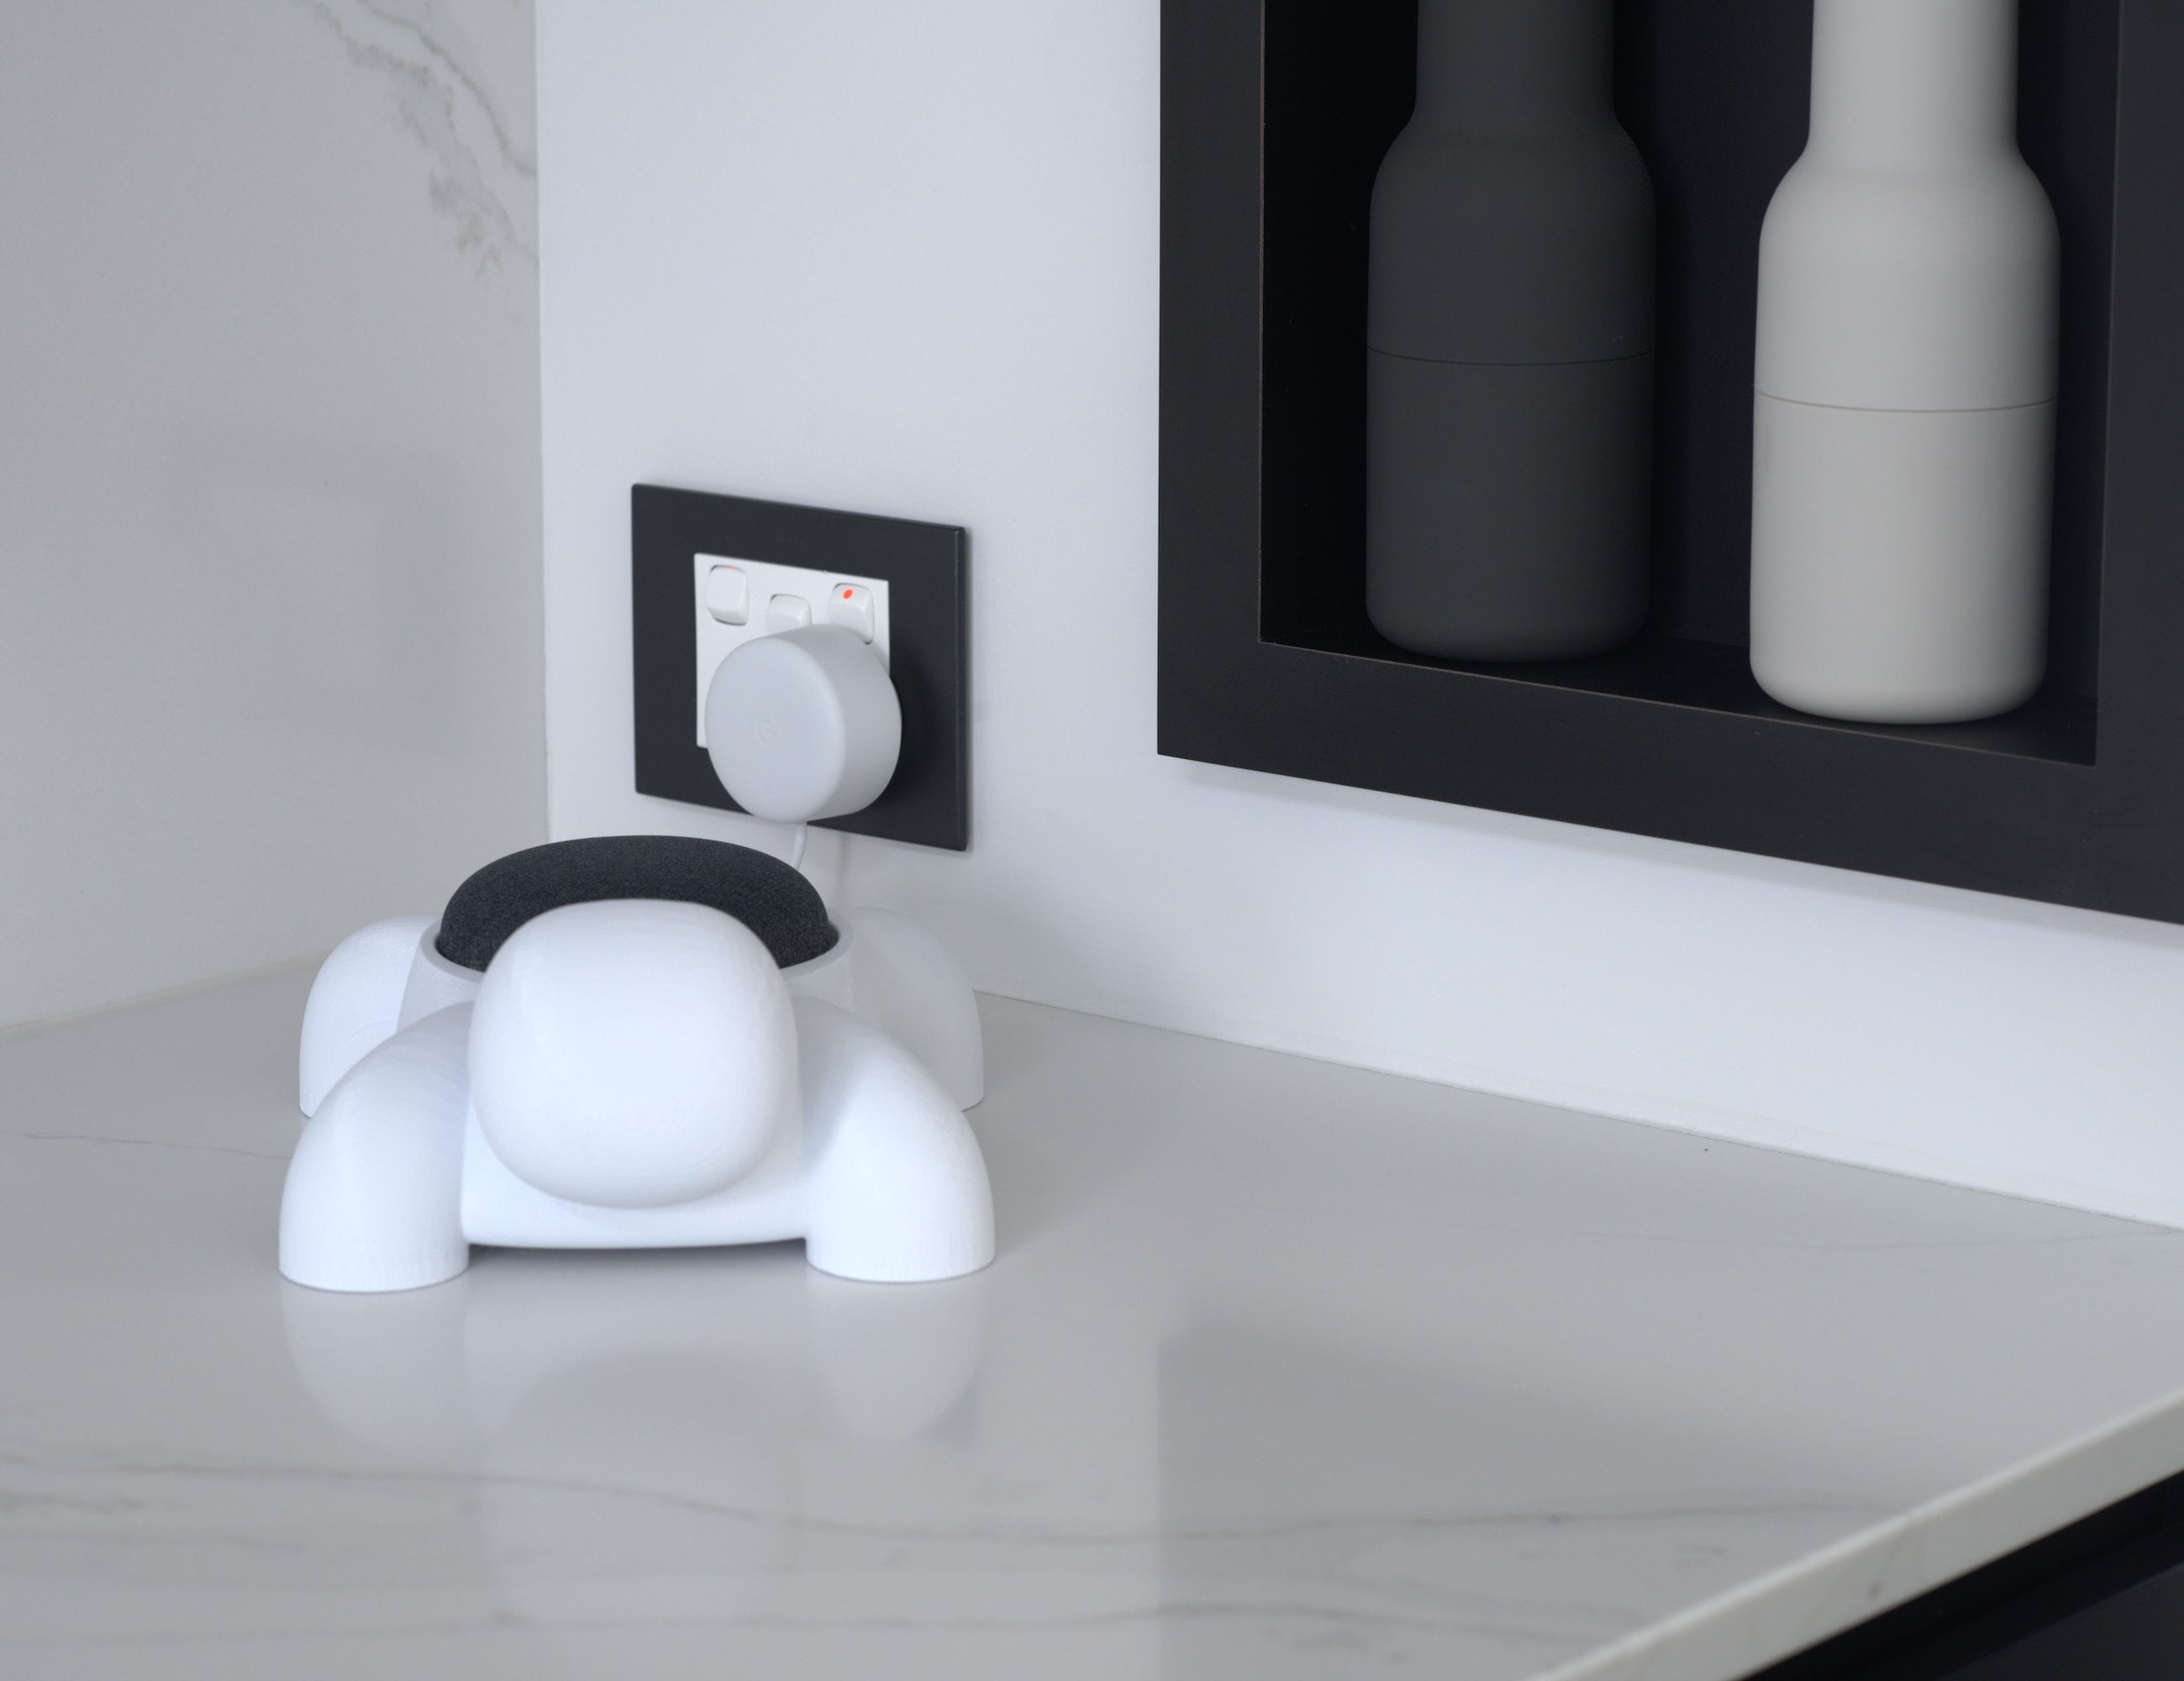 Smurtle Smart Speaker Stand